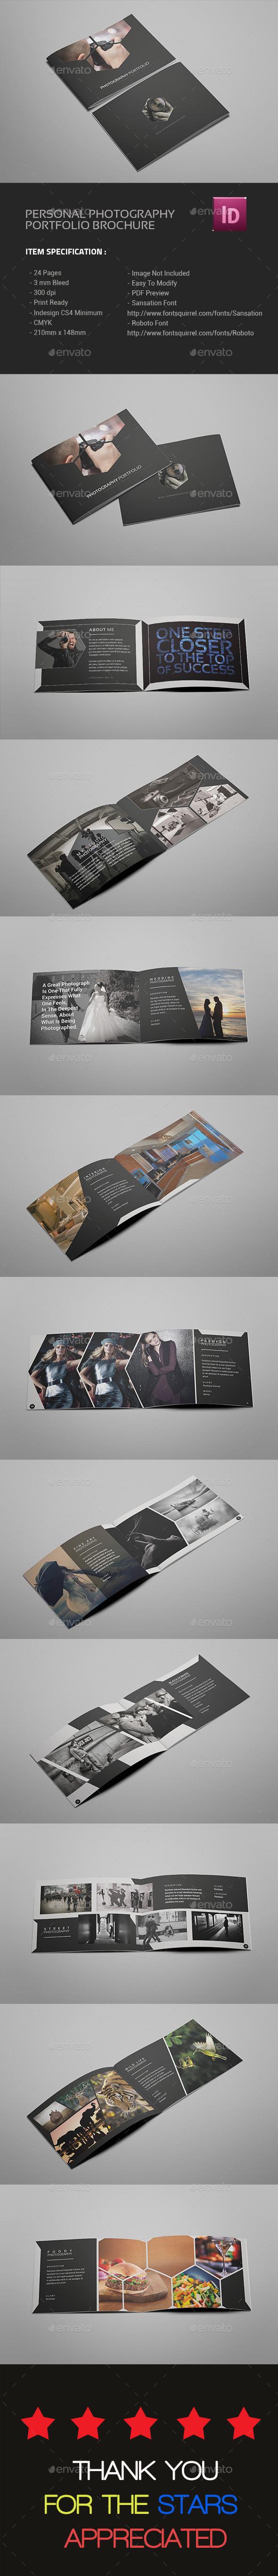 A5 Photography Portfolio Brochure - Portfolio Brochures